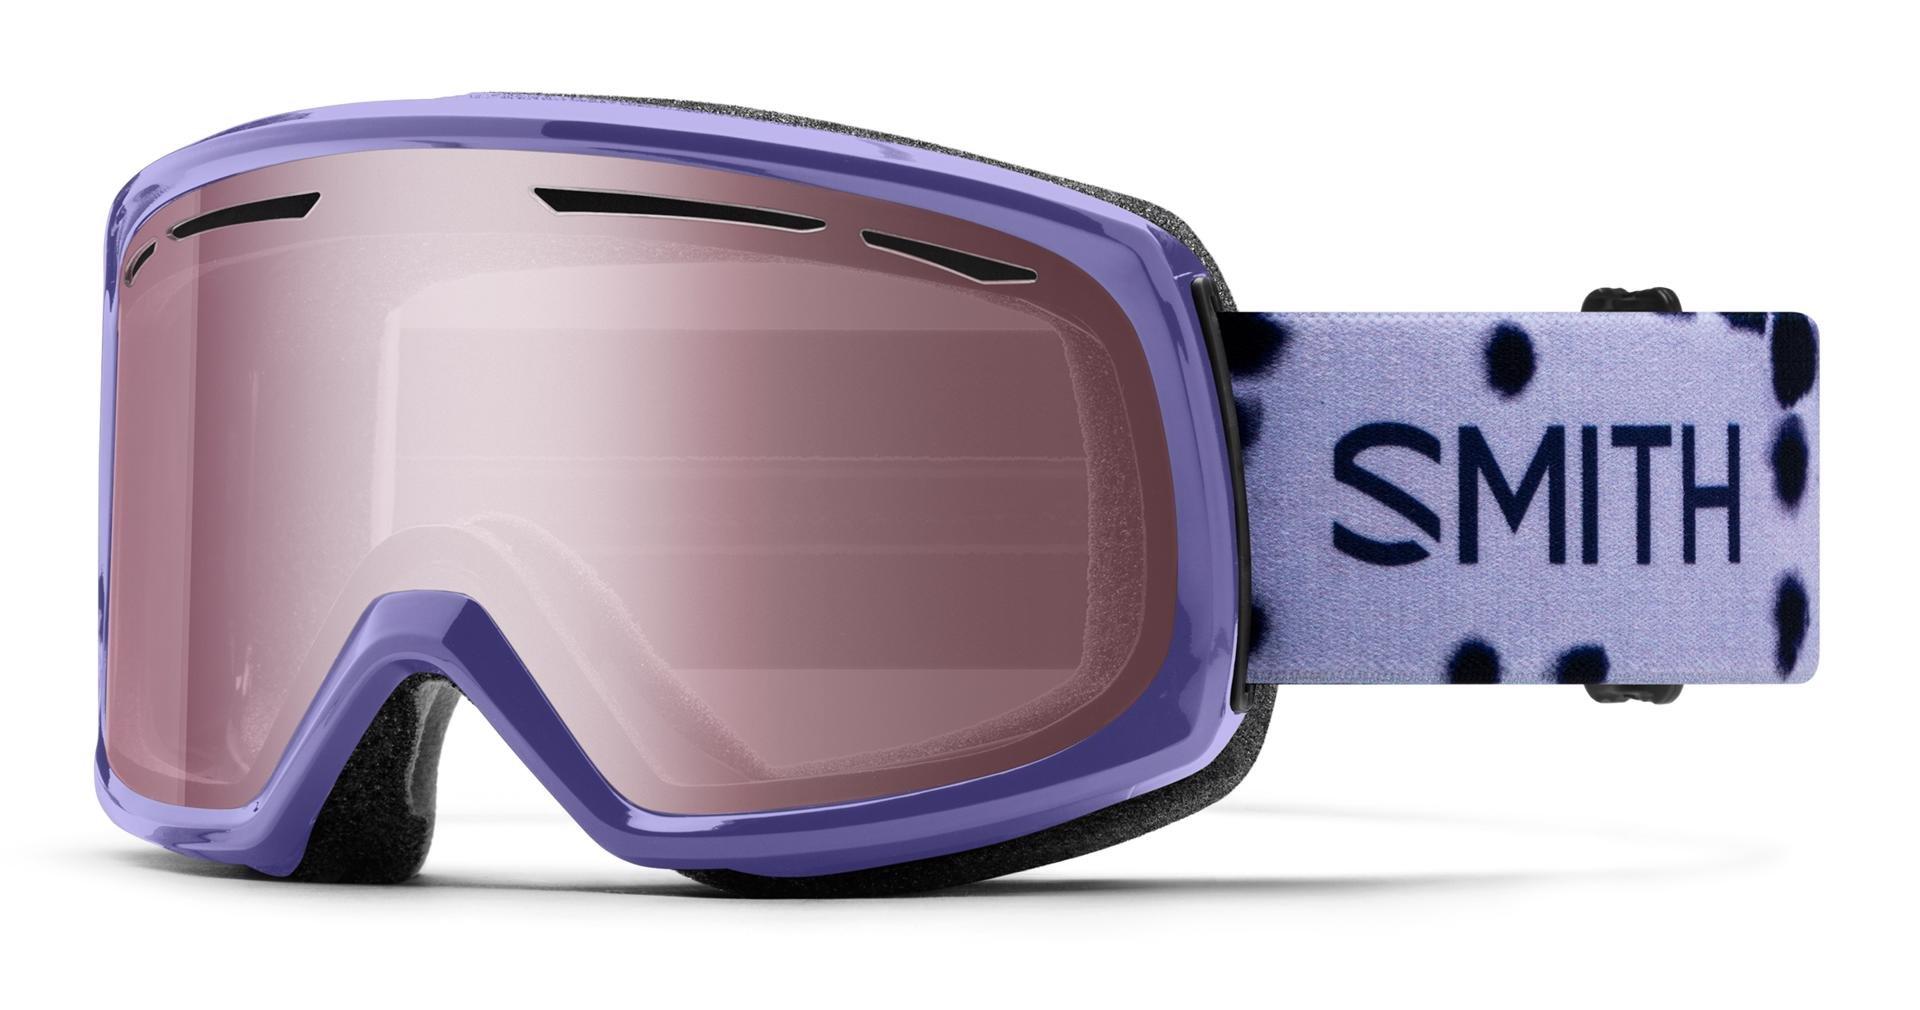 Smith Drift Goggles